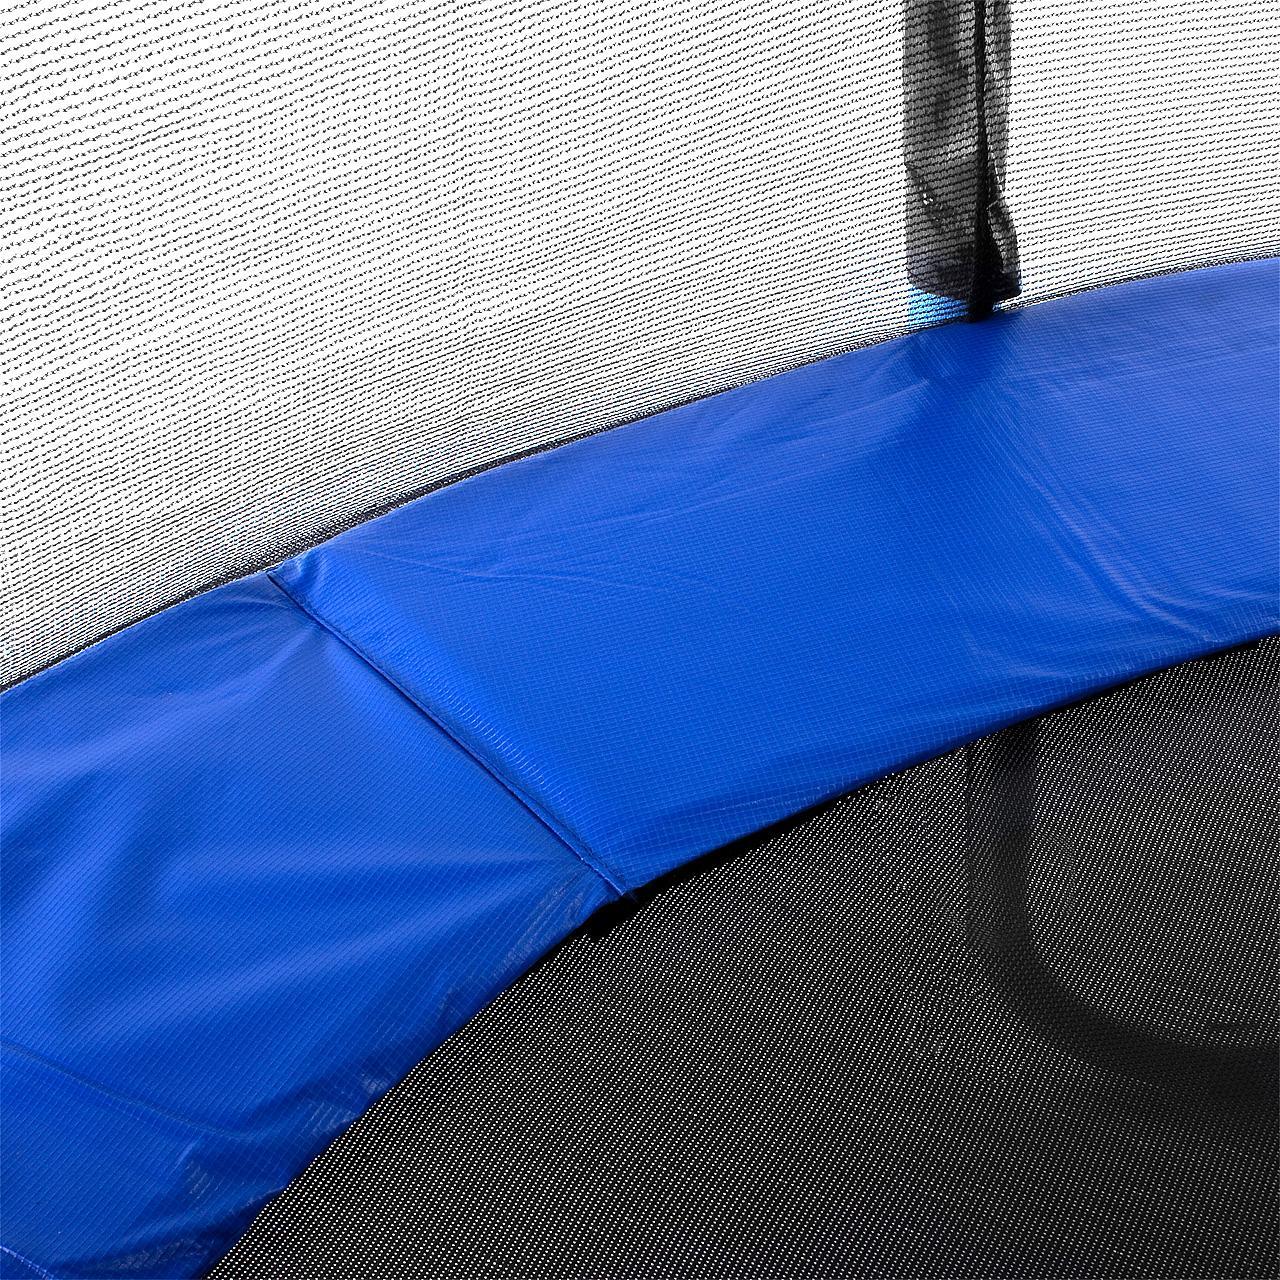 kinetic sports trampolin outdoor garten inkl netz sprungtuch randabdeckung set ebay. Black Bedroom Furniture Sets. Home Design Ideas